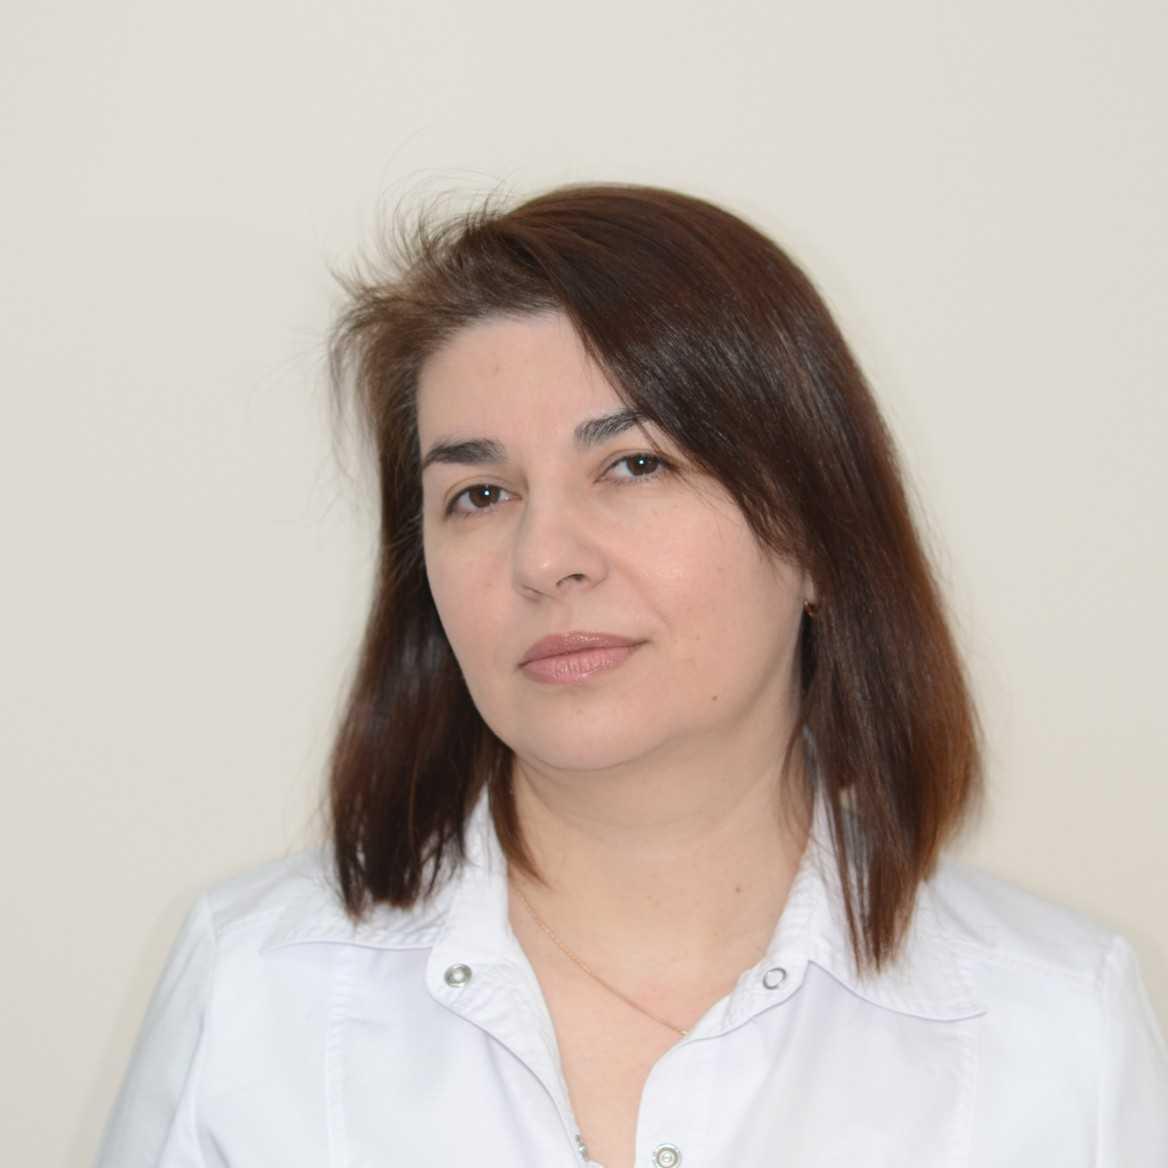 Райлян Оксана Константиновна - фотография